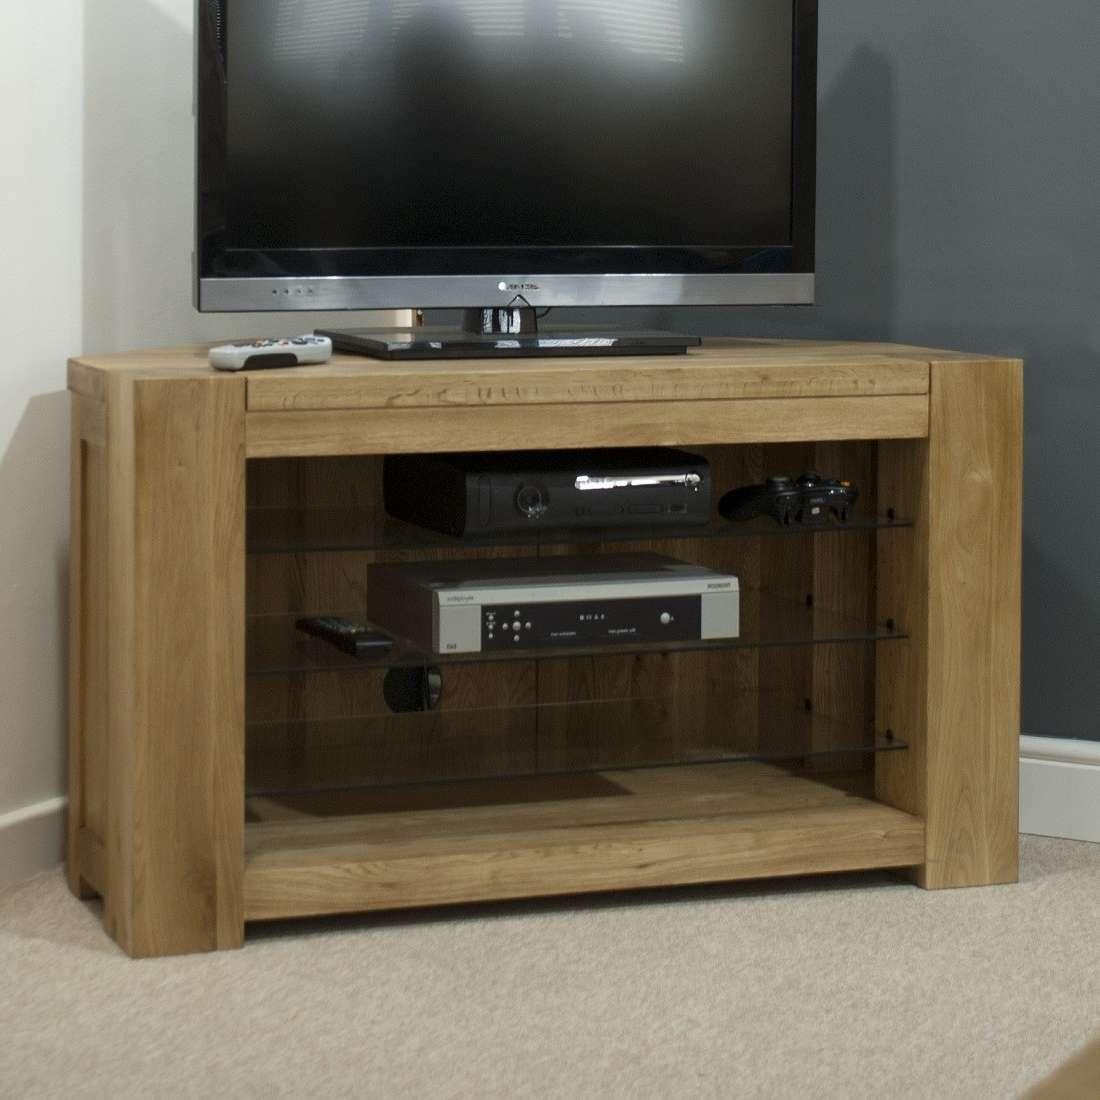 Trend Solid Oak Corner Tv Unit | Oak Furniture Uk Within Solid Oak Tv Cabinets (View 16 of 20)